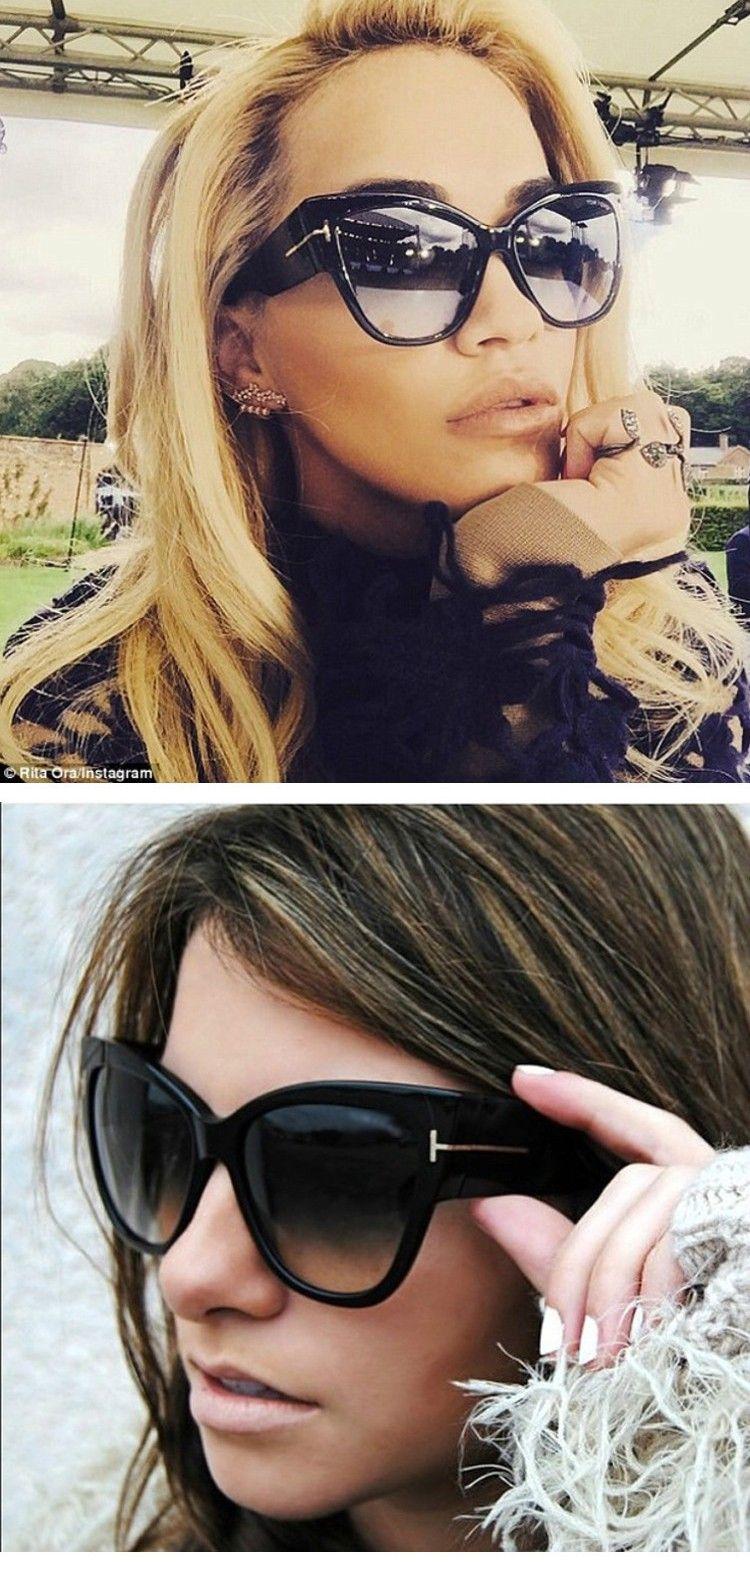 33ad725b58480 2016 New Fashion Cat Eye Sunglasses Women Brand Designer Vintage Luxury  Street Snap Sun Glasses Oculos De Sol Feminino Gafas